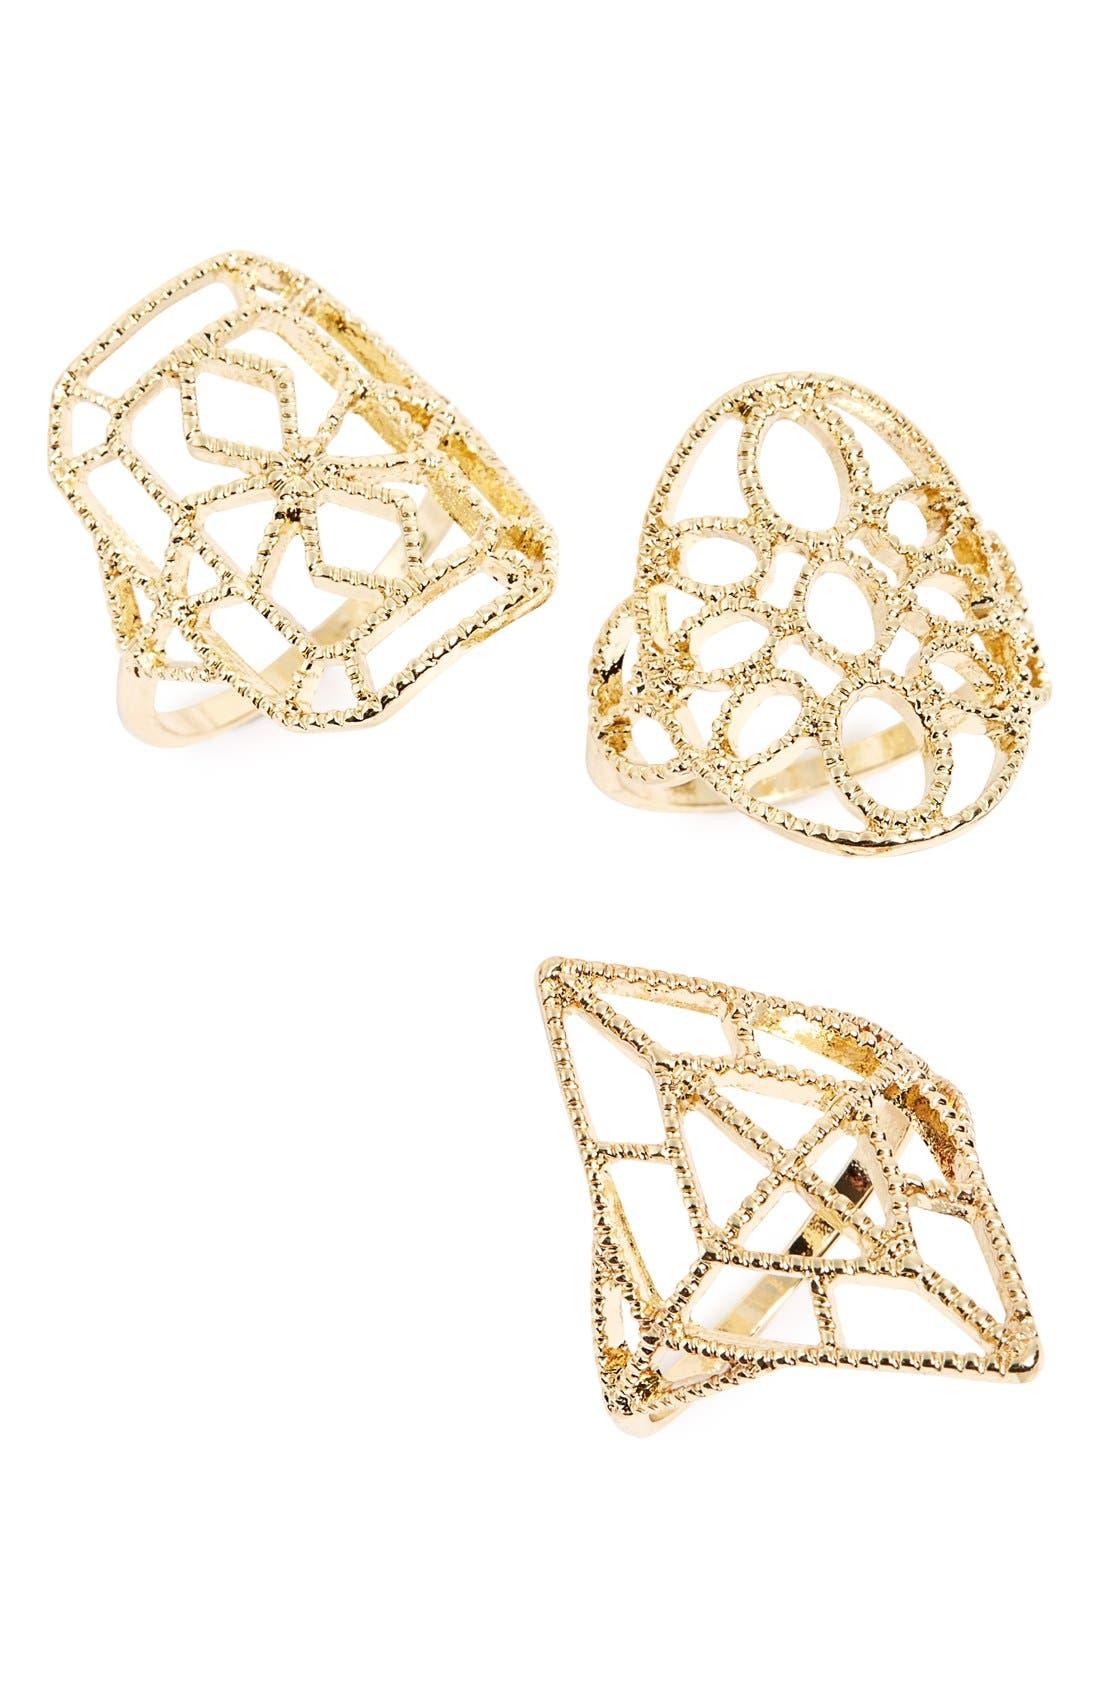 Alternate Image 1 Selected - Topshop Filigree Cutout Rings (Set of 3)